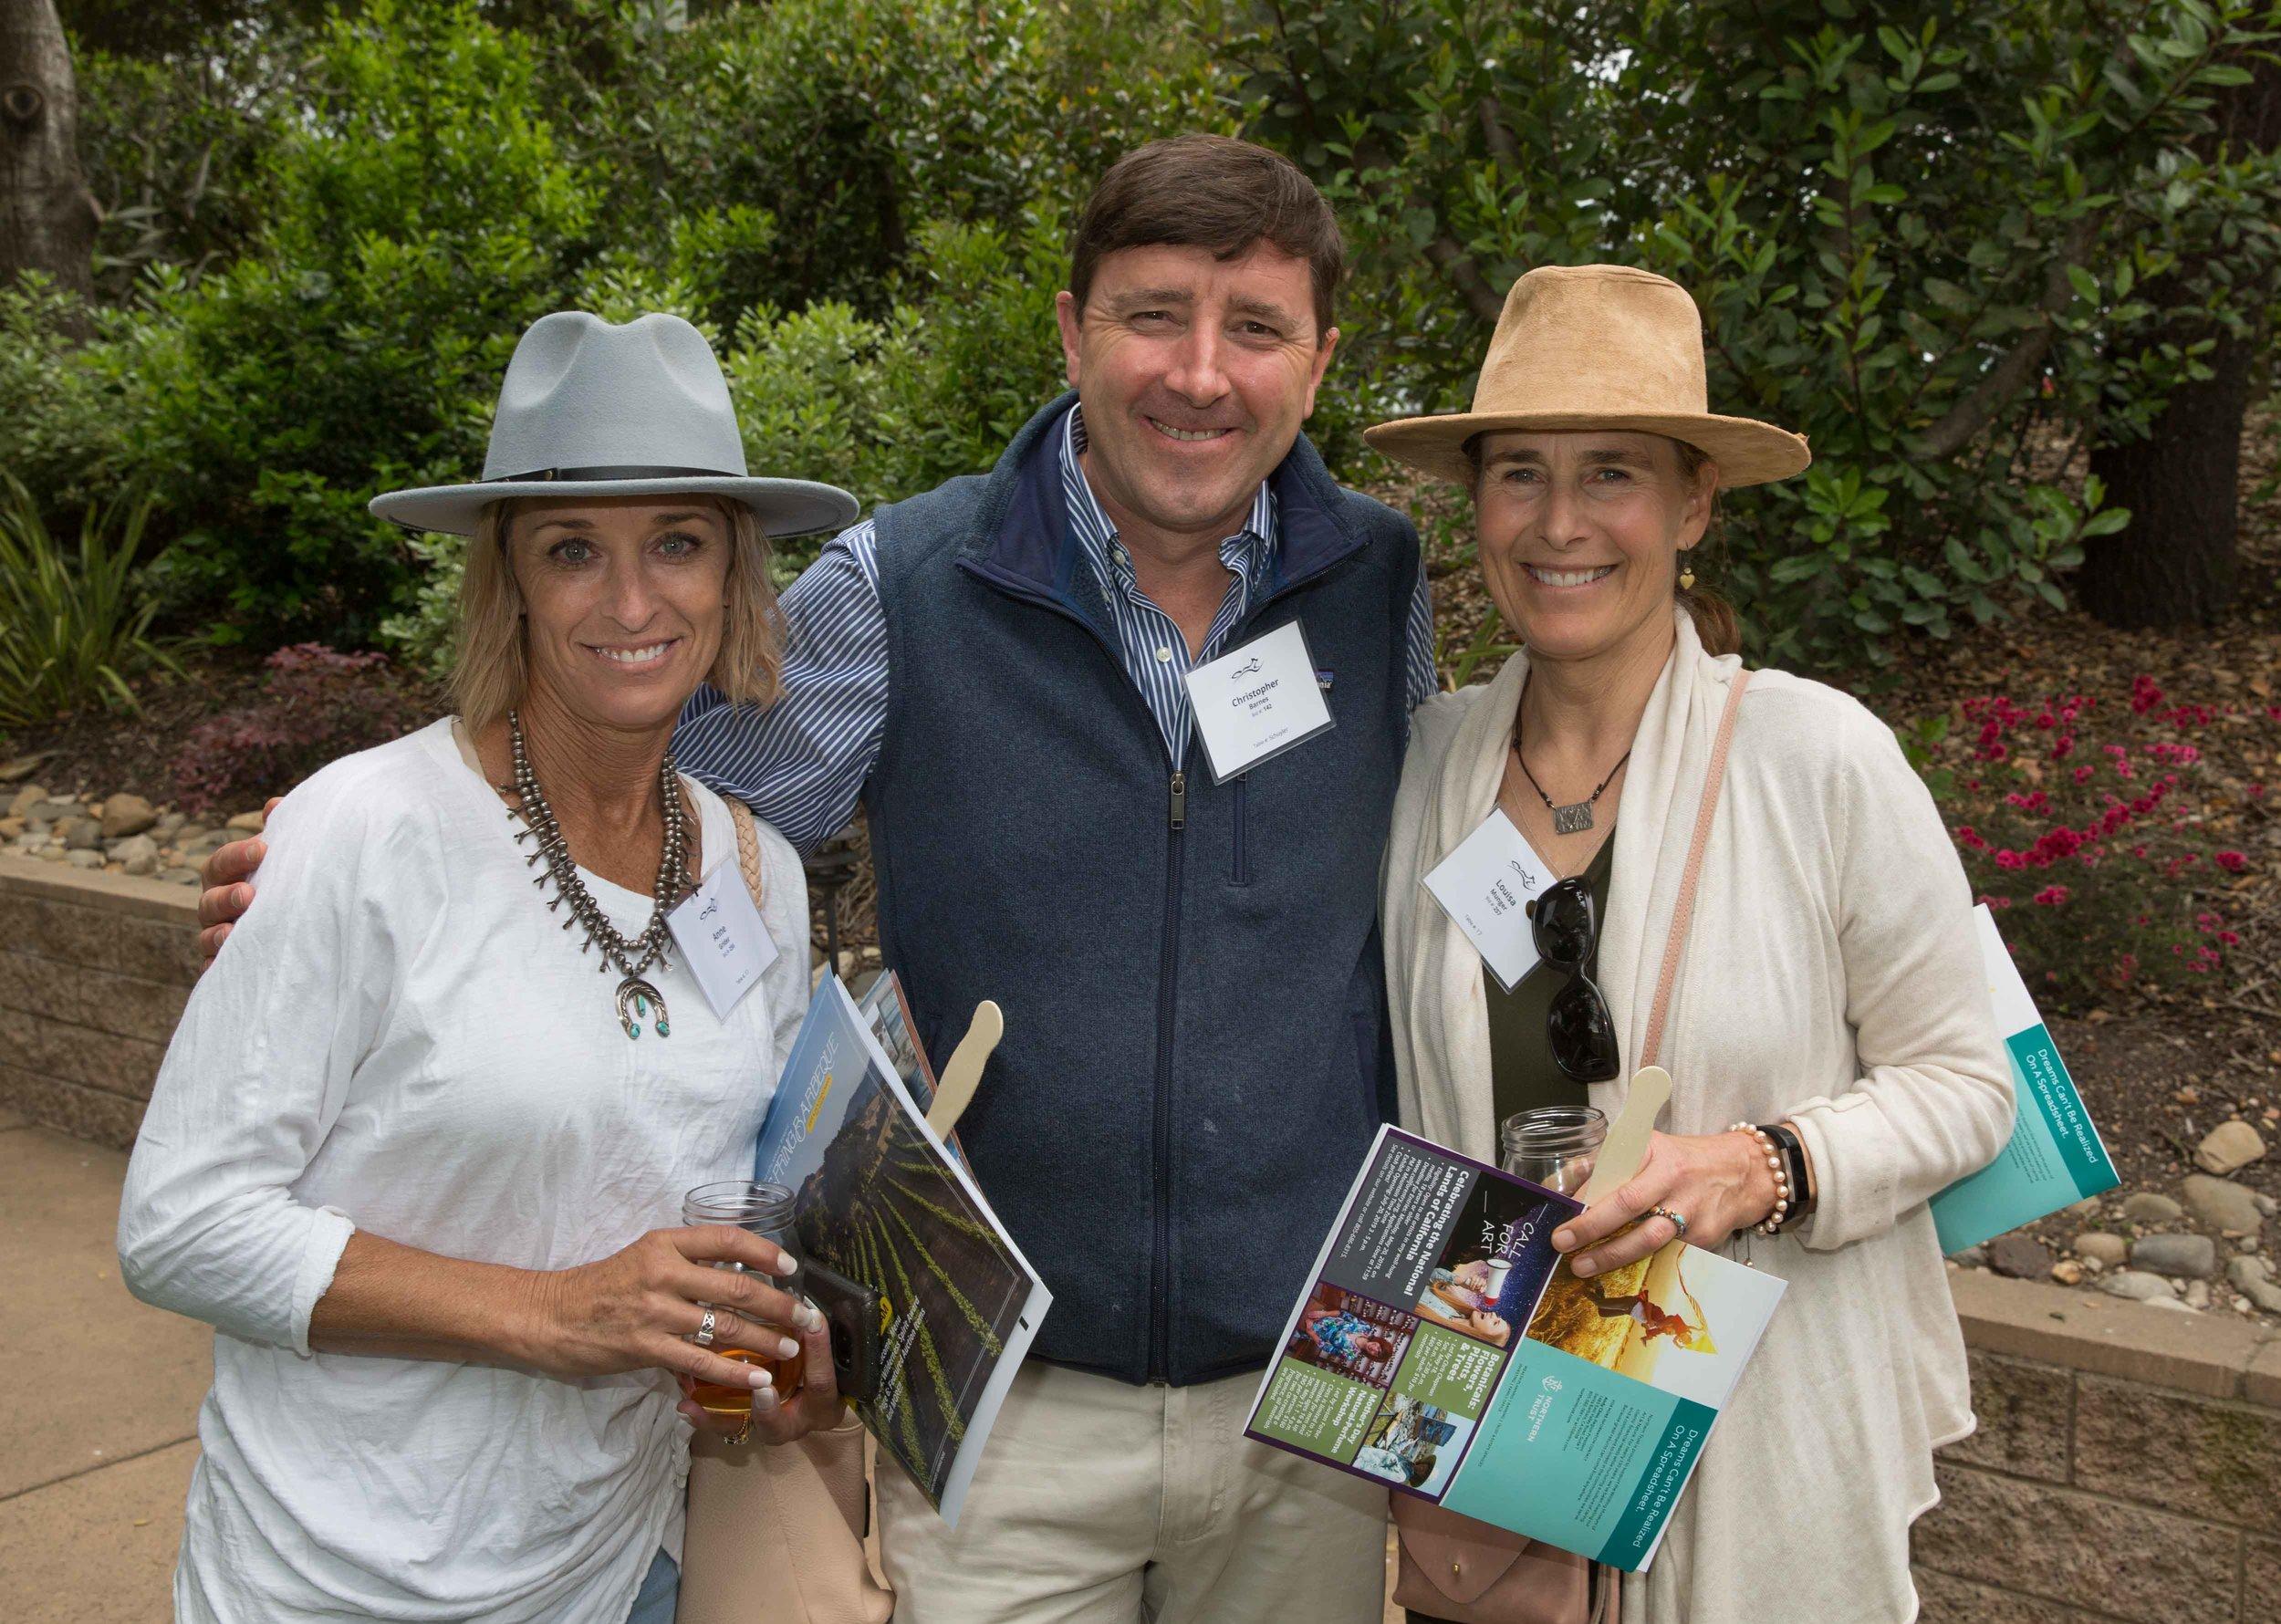 Ann Grider, Christopher Barnes, and Louisa Munger